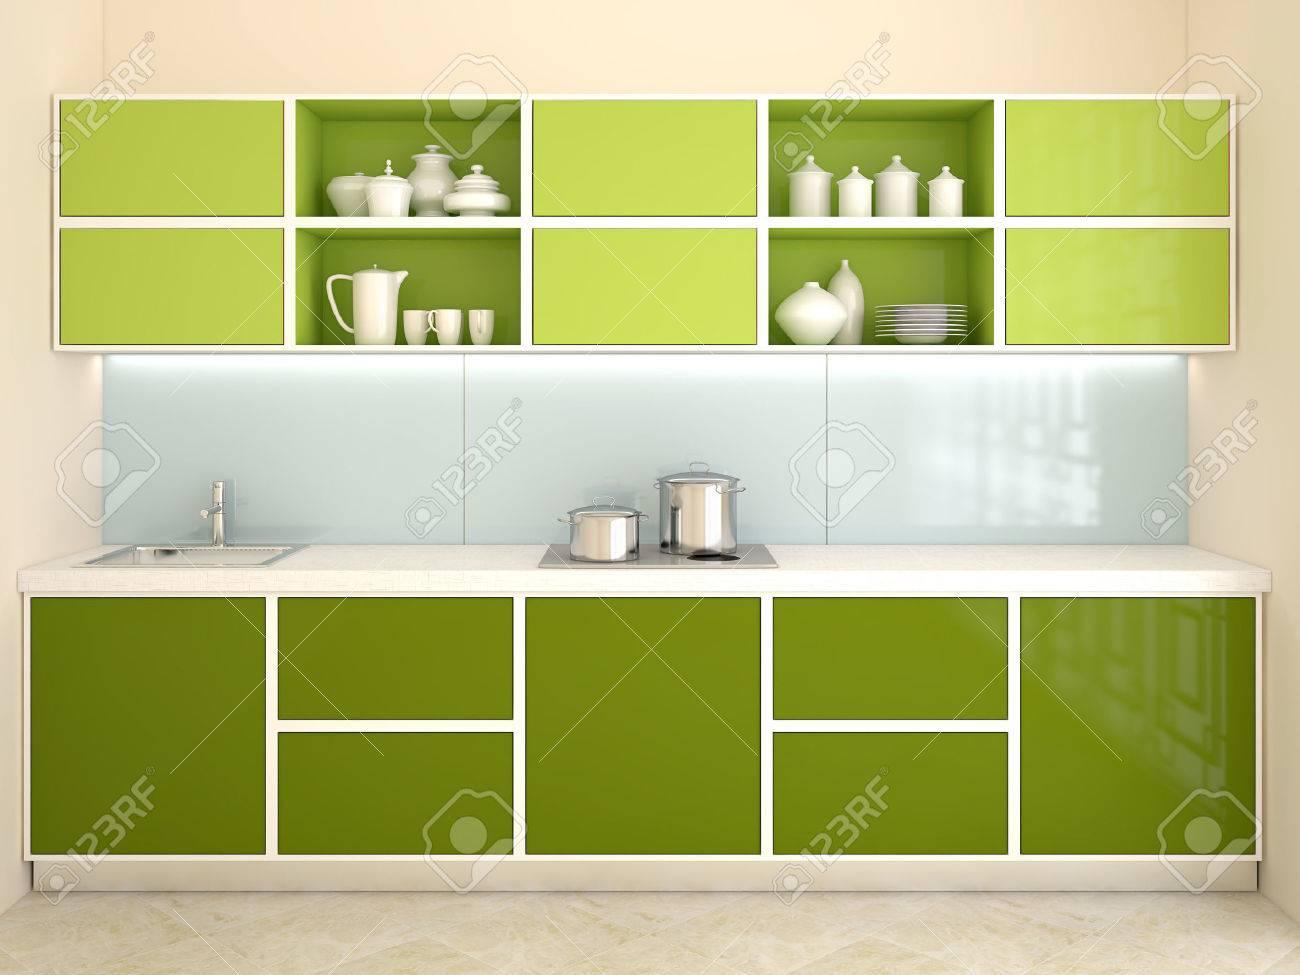 Interieur De La Cuisine Verte Moderne Vue Frontale Rendu 3d